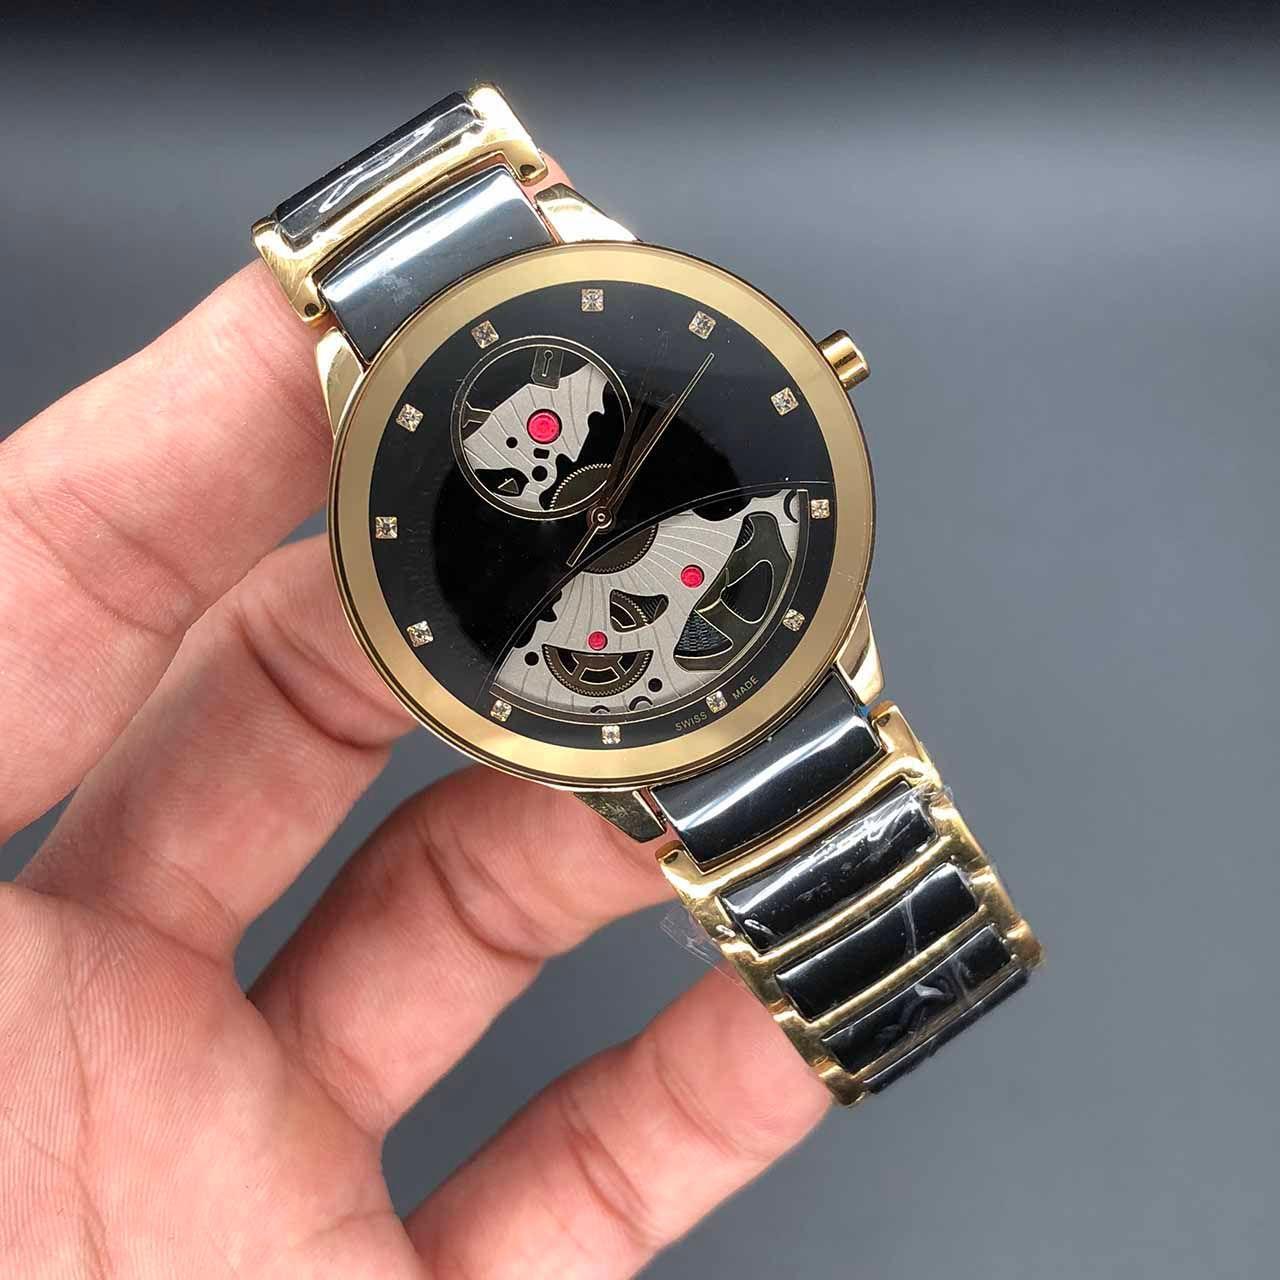 05708094240f Unisex Luxury Watches R30180162 Lady Famous Brand Modern Men S Qaurtz Fashion  Black Ceramic Watch Ladies Casual Designer Mens Sport Watch Watches Sales  Sale ...